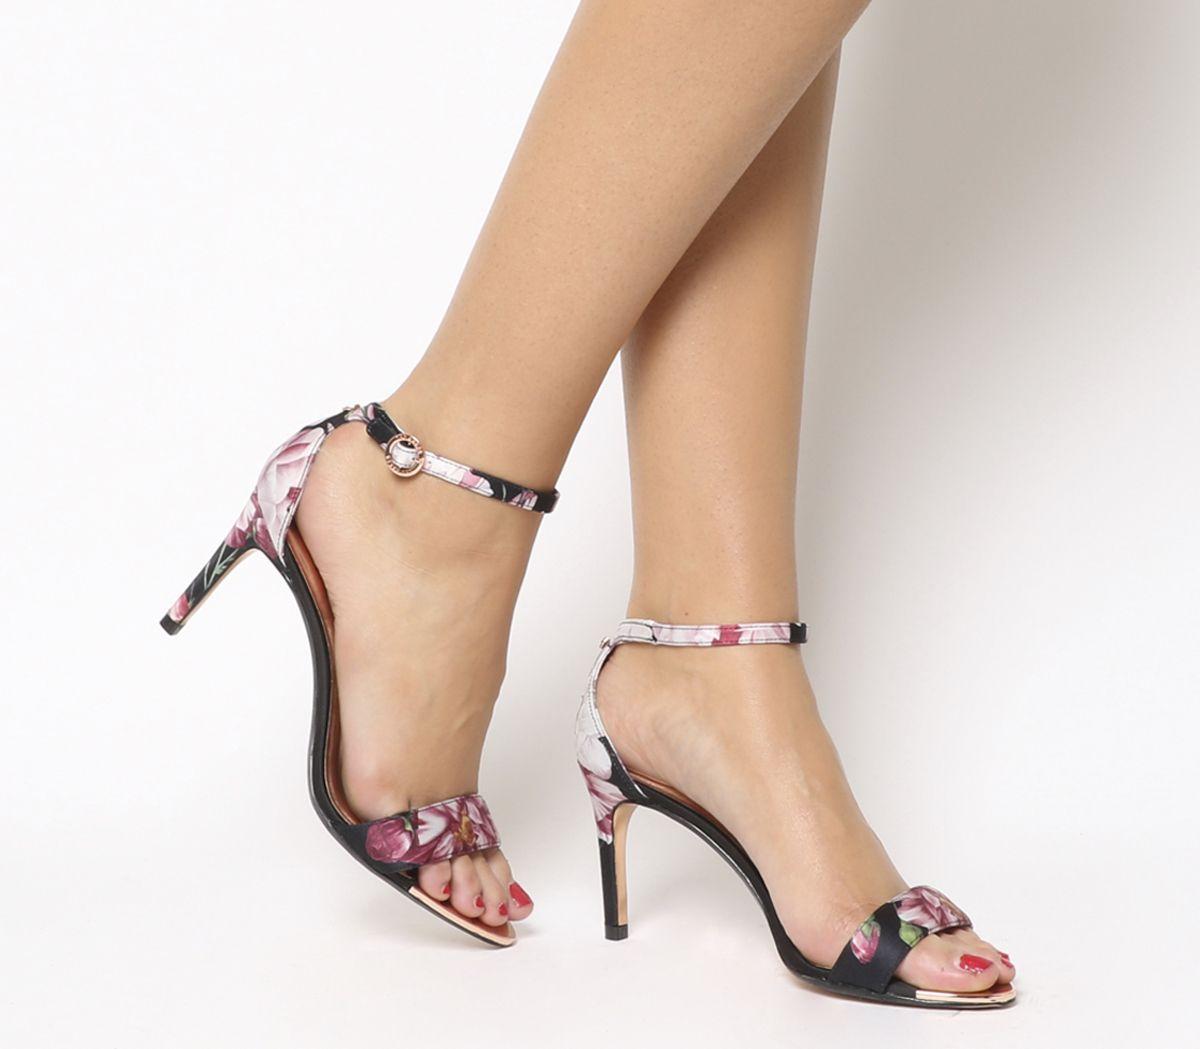 fcccb2689b7 Sentinel Womens Ted Baker Mylli Heels Black Iguazu Heels